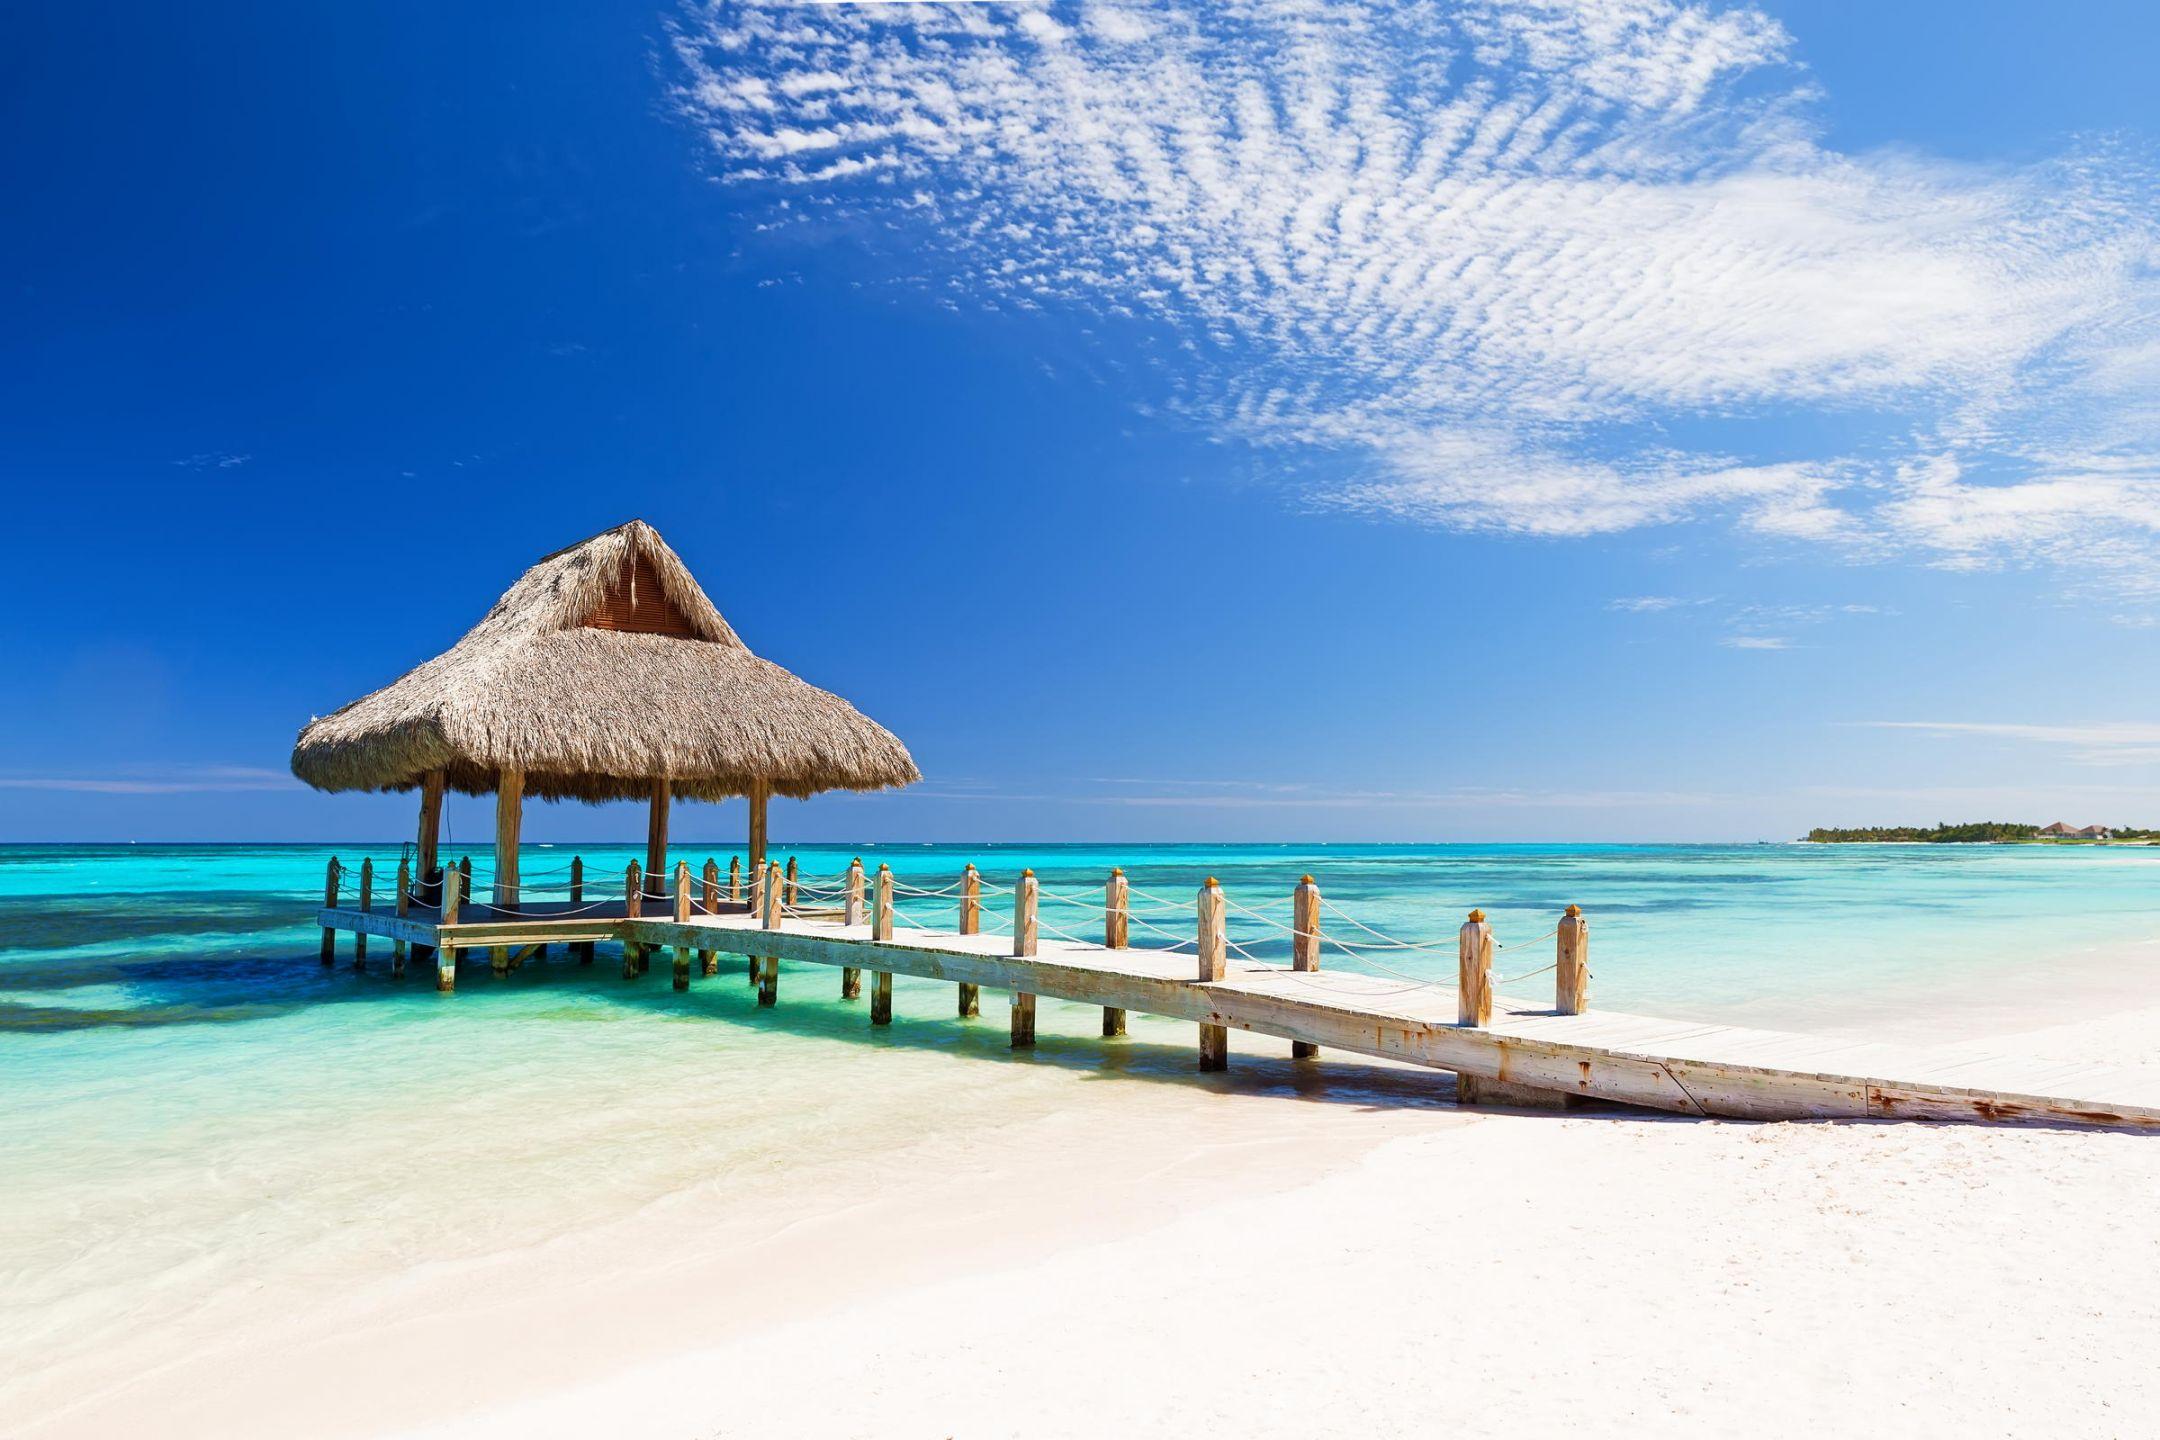 H Δομινικανή Δημοκρατία είναι κράτος της Καραϊβικής στο νησί Ισπανιόλα. Συνορεύει με την Αϊτή και καταλαμβάνει τα ανατολικά 2/3 του νησιού. Πρωτεύουσά της είναι ο Άγιος Δομίνικος. Τροπικό κλίμα όλο το χρόνο, ιστορικές πόλεις και πολιτισμός, ατέλειωτες παραλίες, βουνά, καταρράκτες και πολλά ακόμα σε αυτόν τον παραμυθένιο προορισμό.